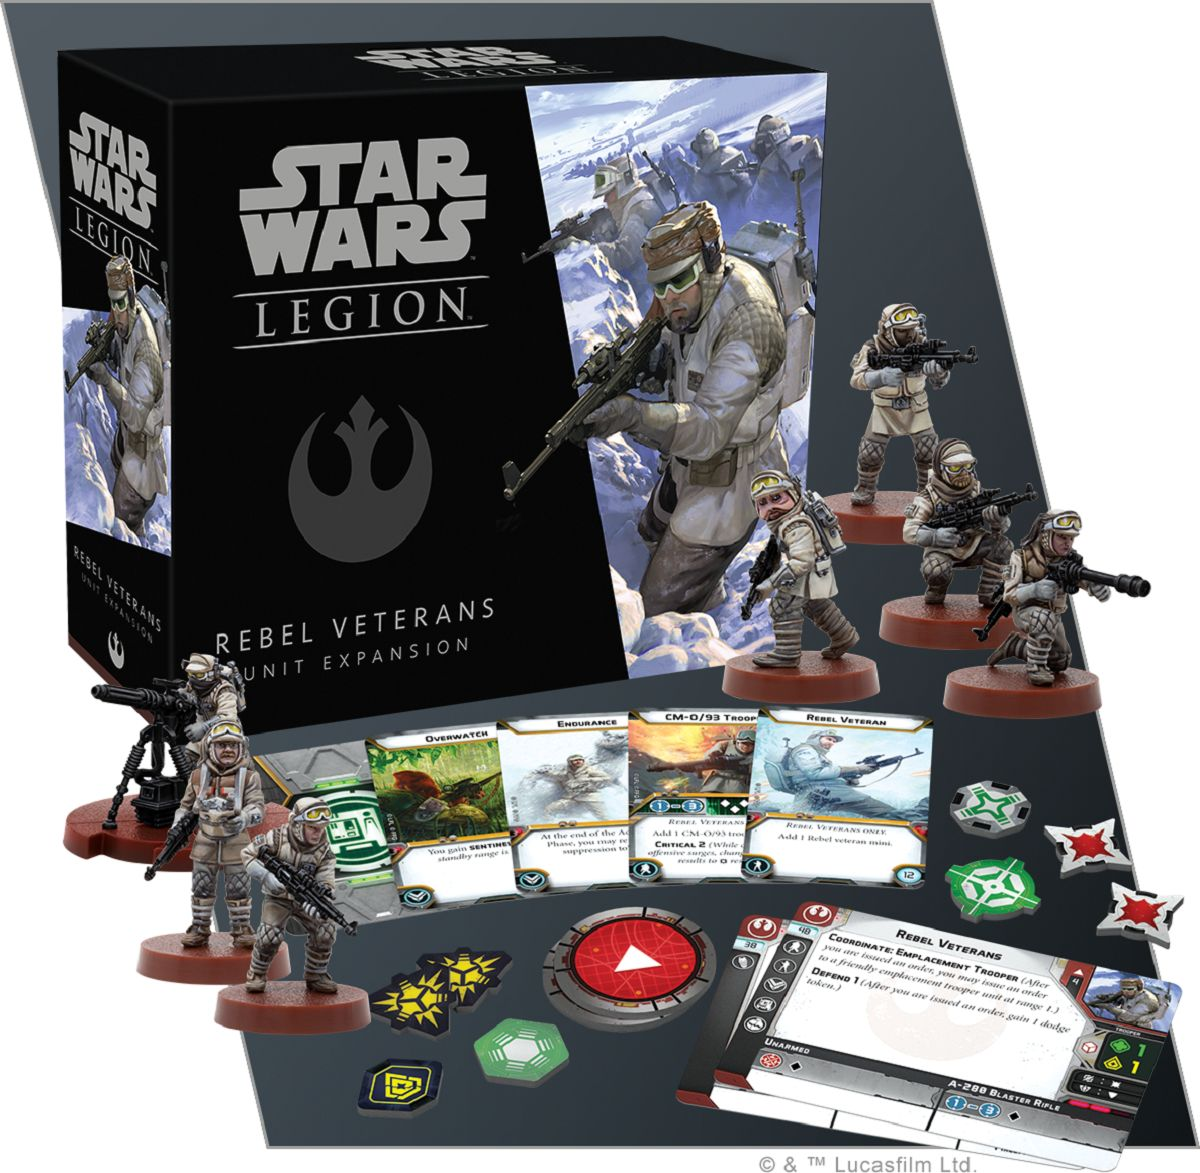 Star Wars Legion Preview Of Rebel Veterans From Ffg